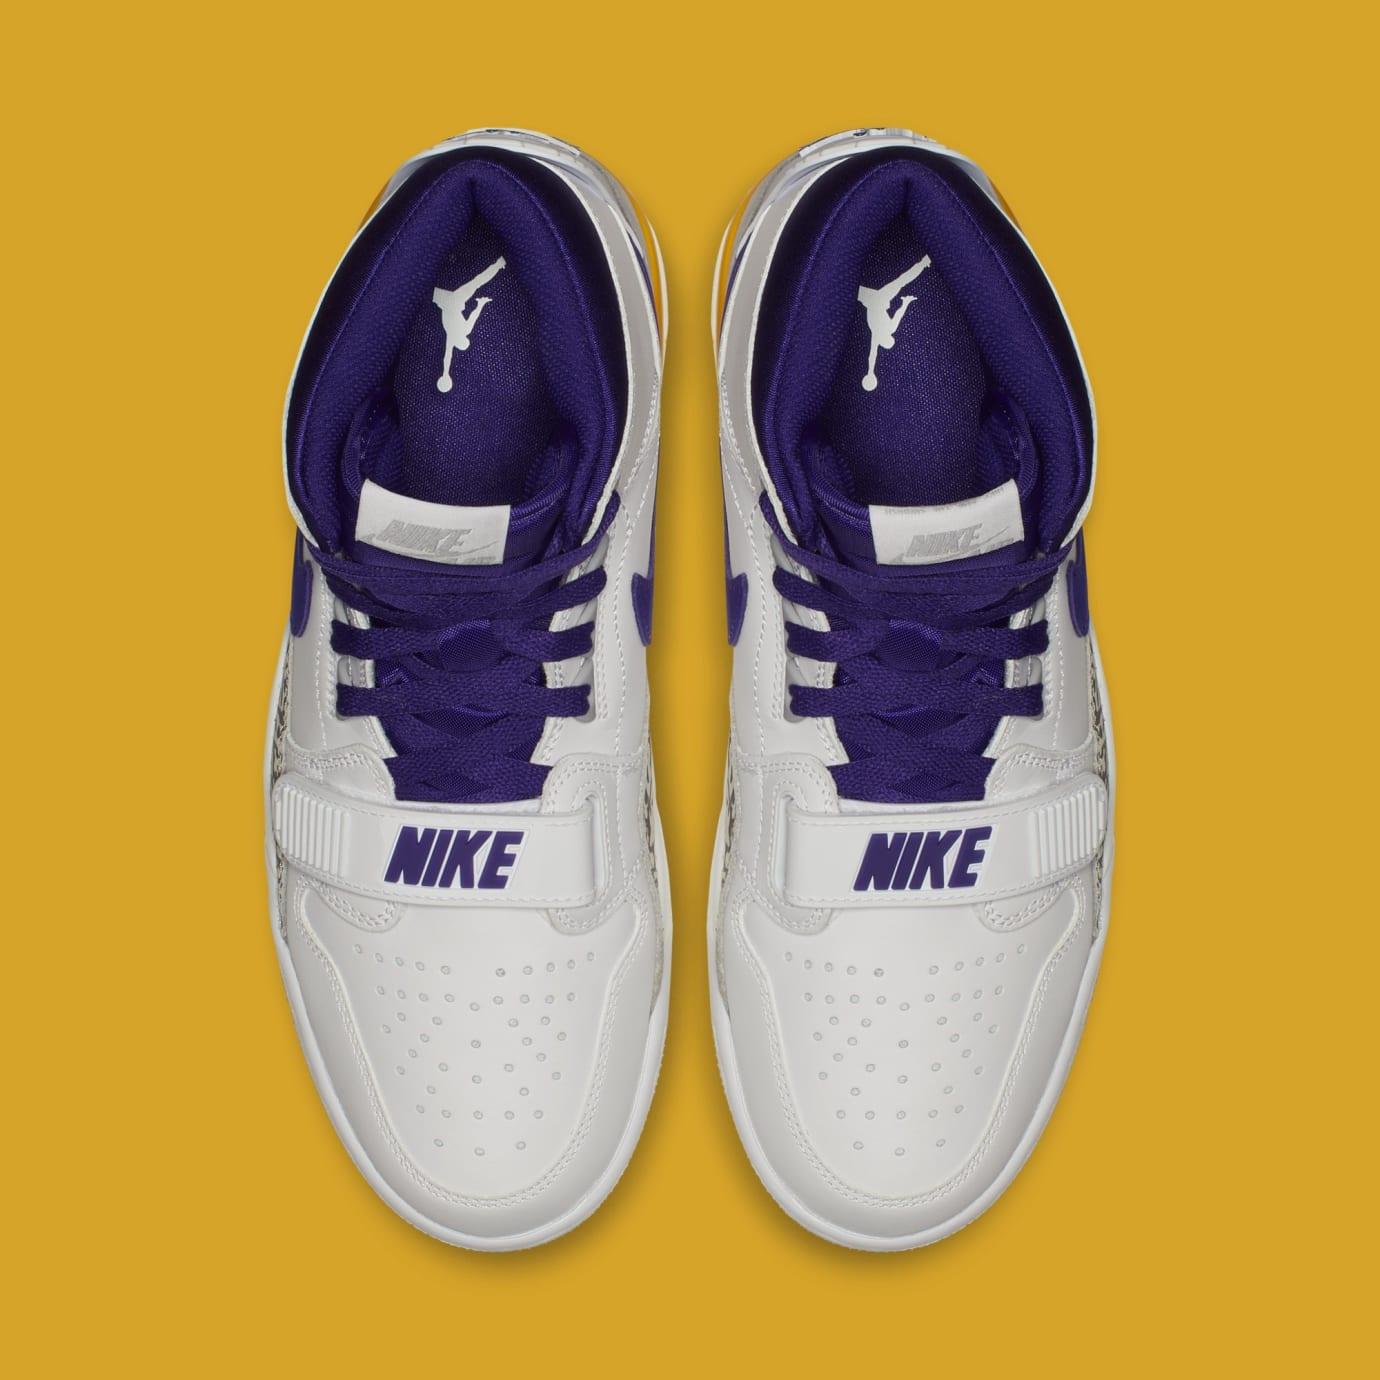 Jordan Legacy 312 'White/Field Purple-Amarillo' AV3922-157 (Top)